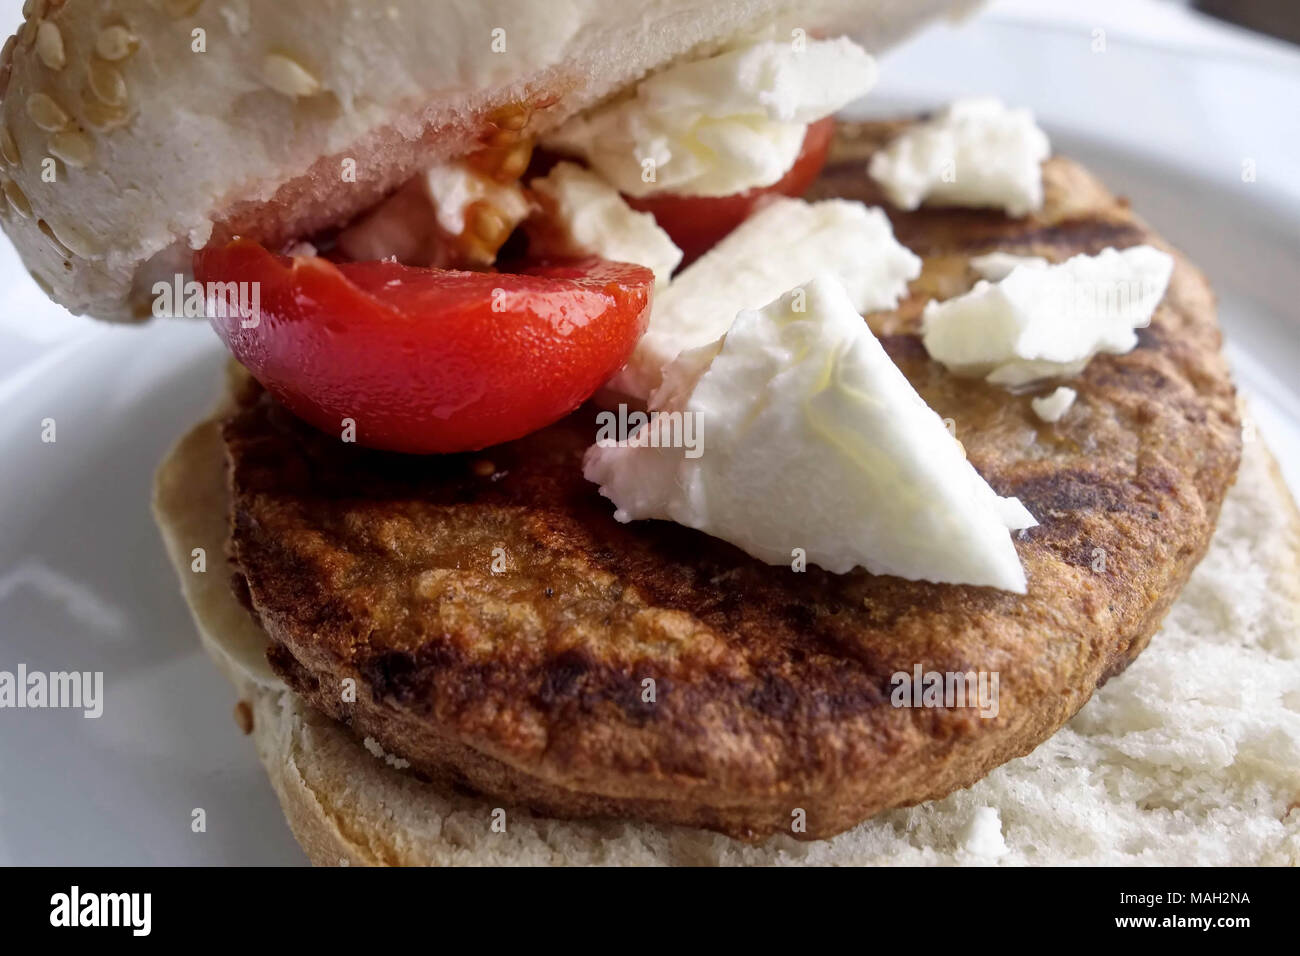 Veggie Burger with Feta Cheese - Stock Image